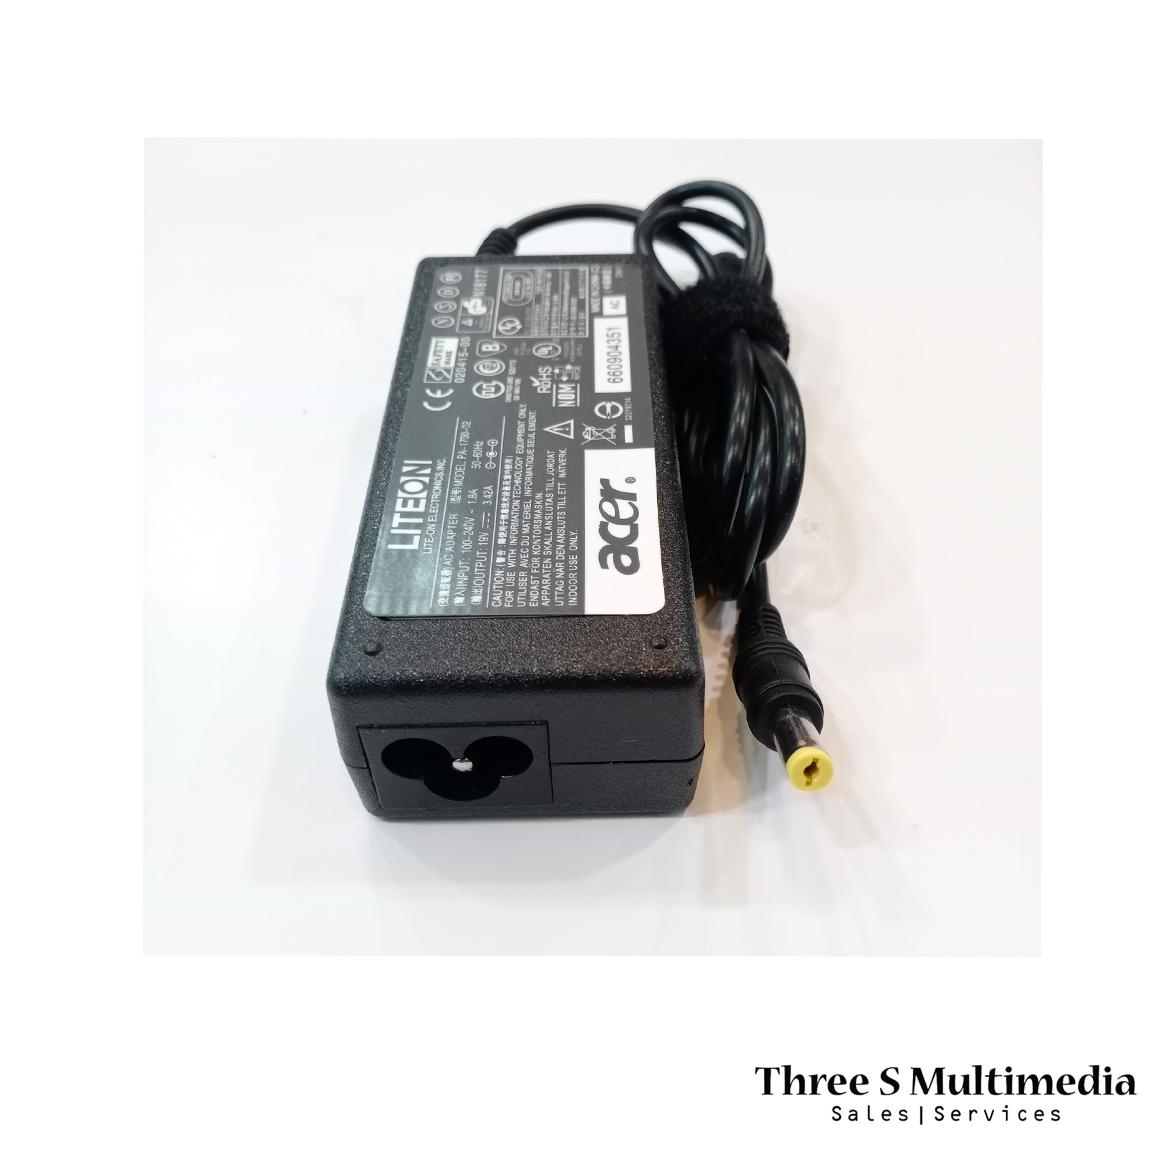 ACER 19V 3.42A ADAPTER FOR LAPTOP MODEL PA-1700-02